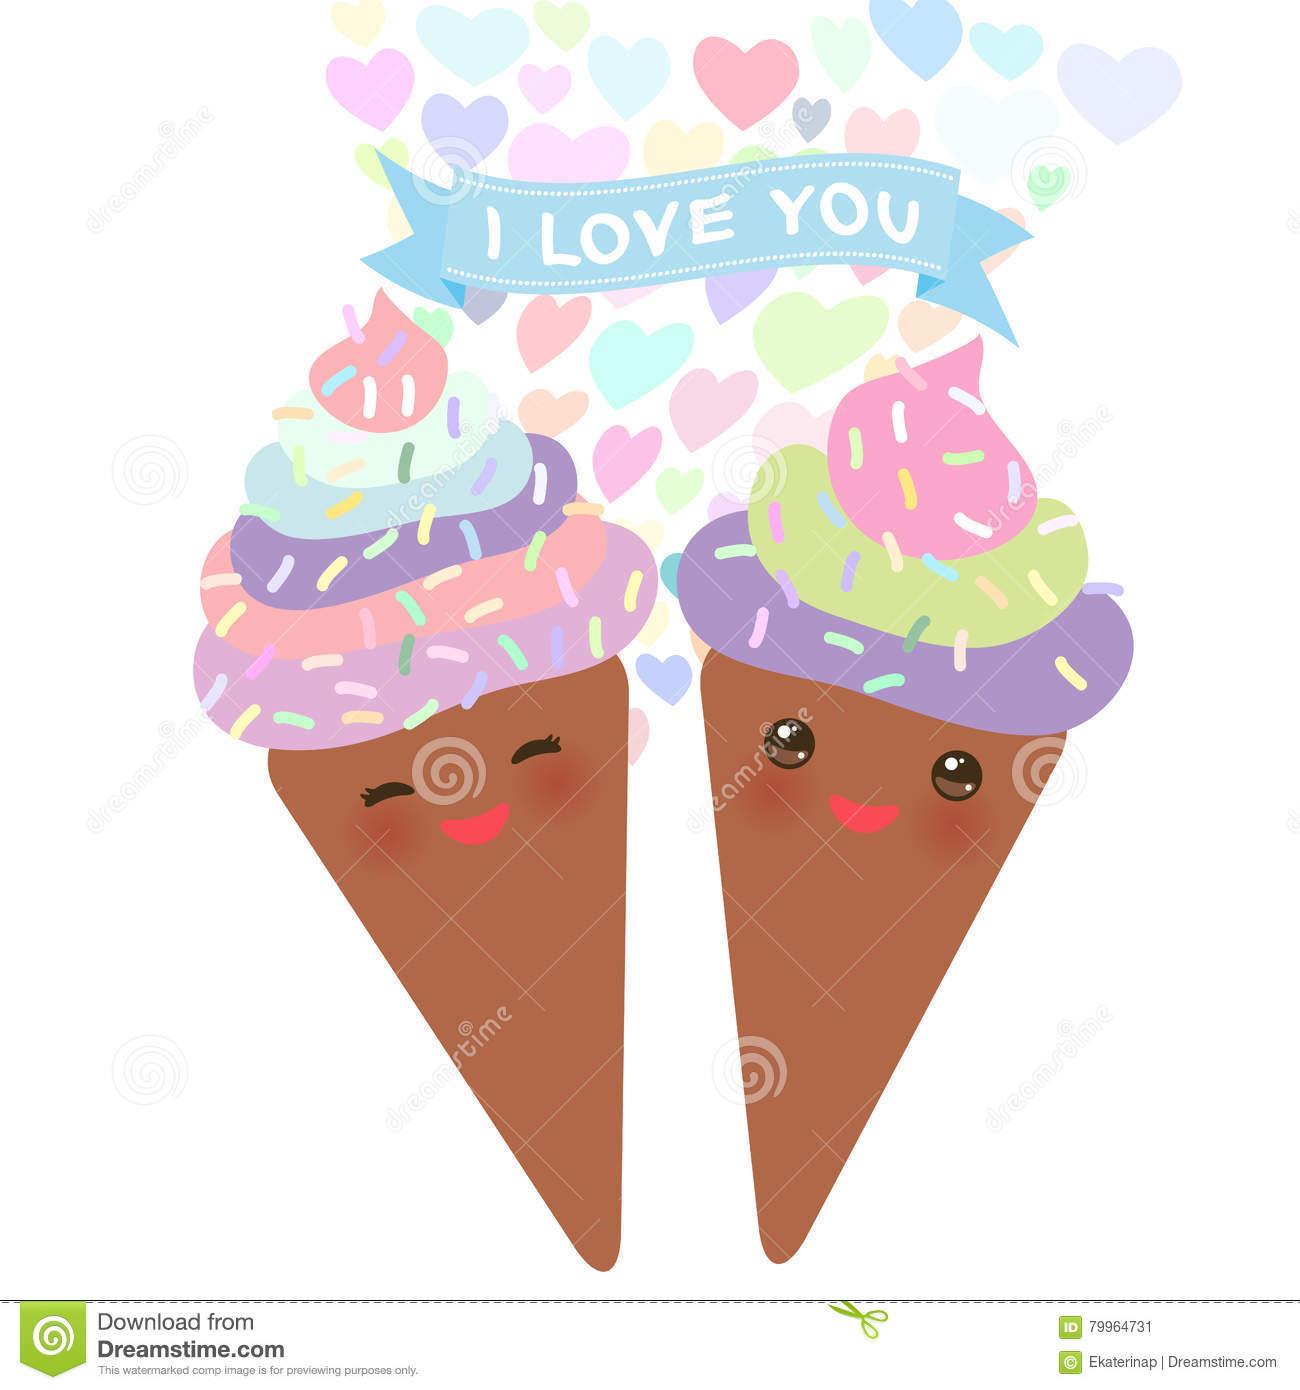 I Love You Card Design With Chocolate Ice Cream Waffle Cone Kawaii.